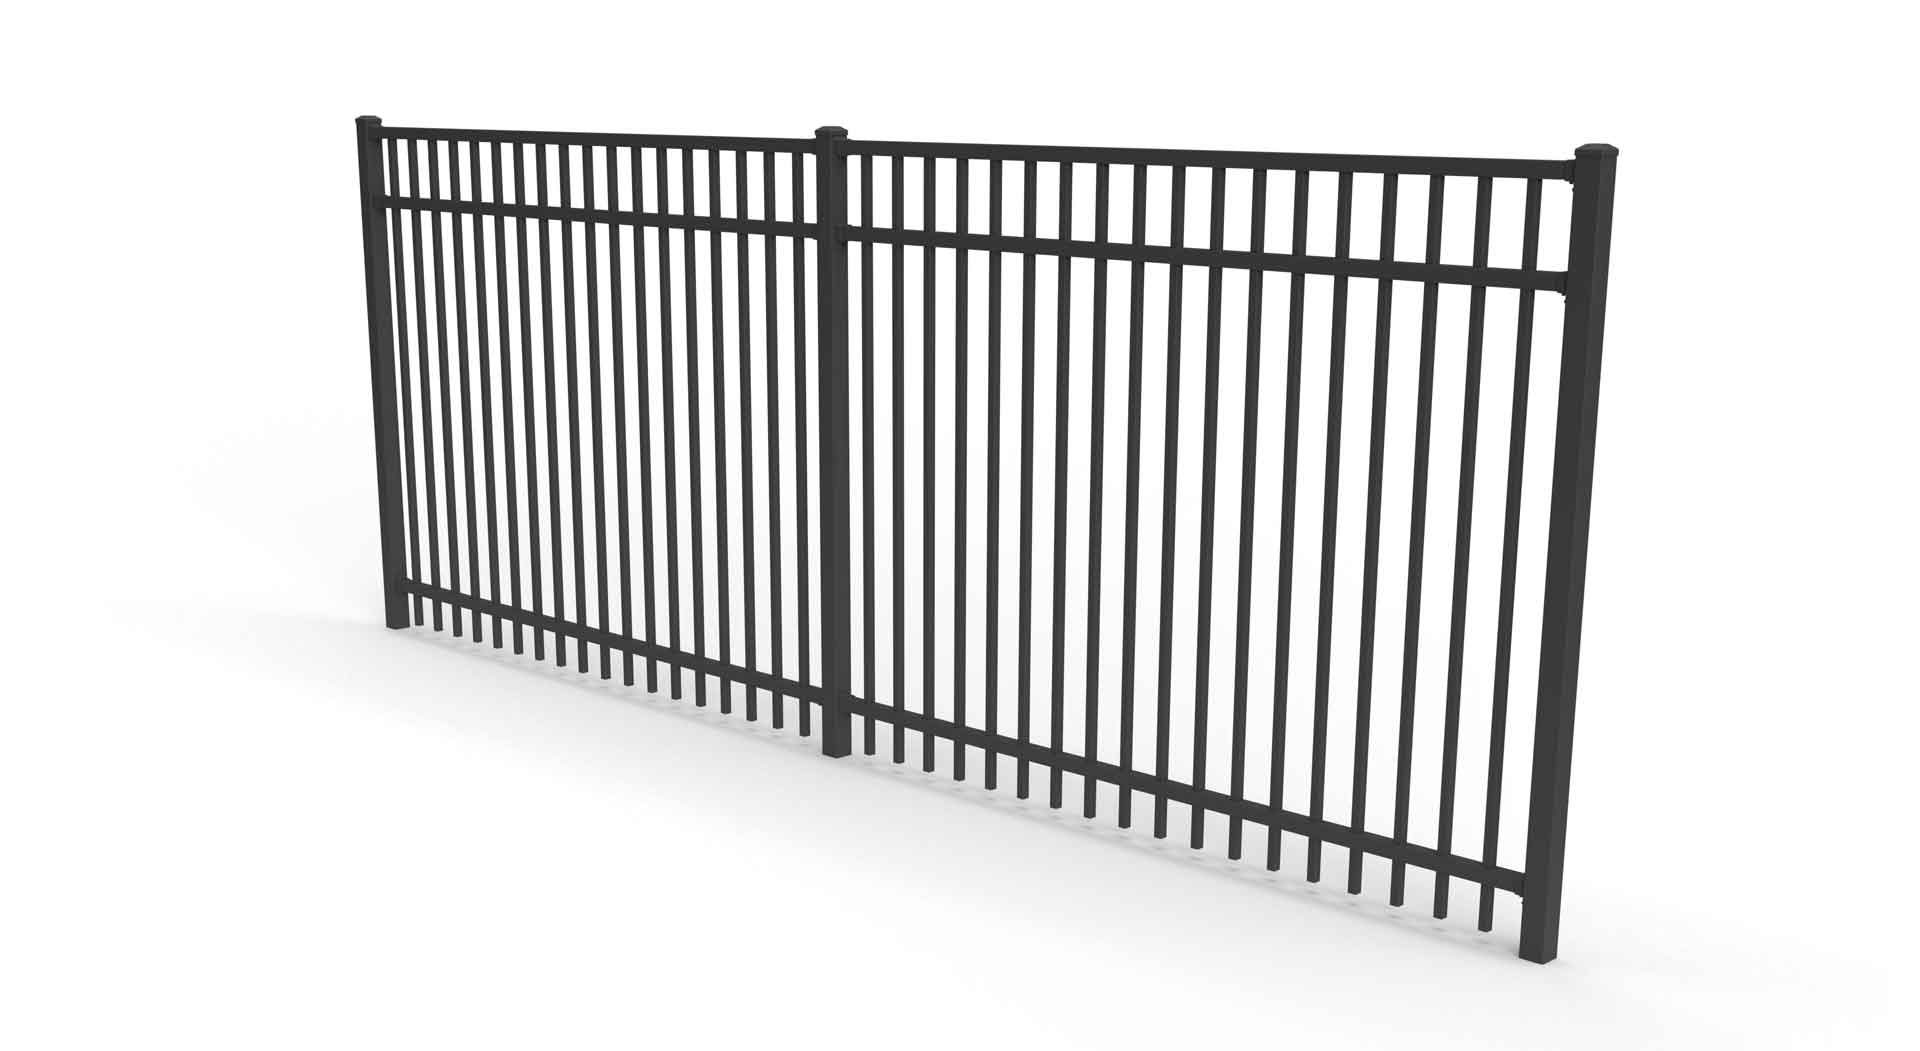 School Fencing panel Assure HD fence panel